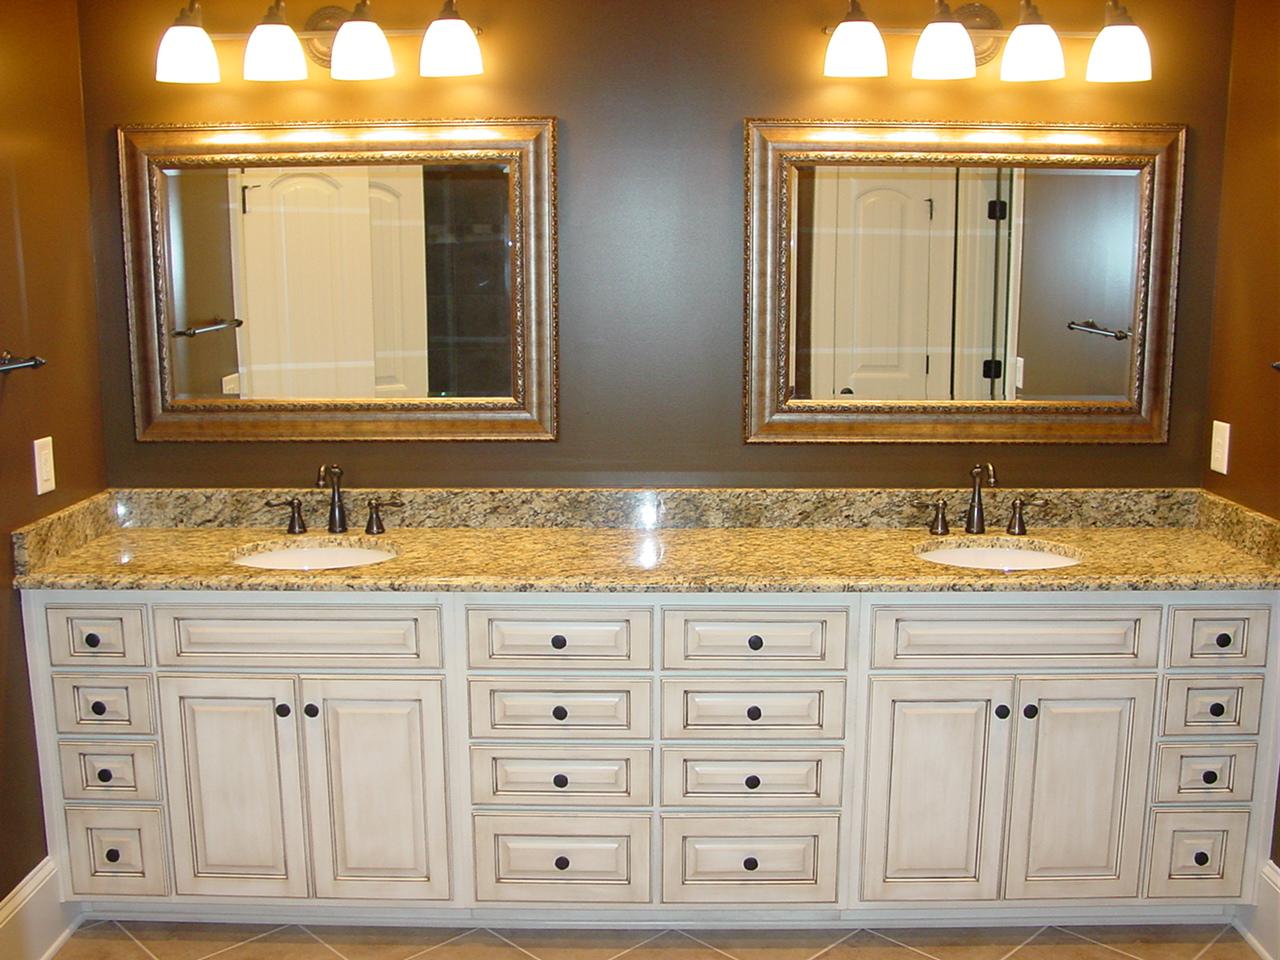 Inexpensive Bathroom Remodel Ideas